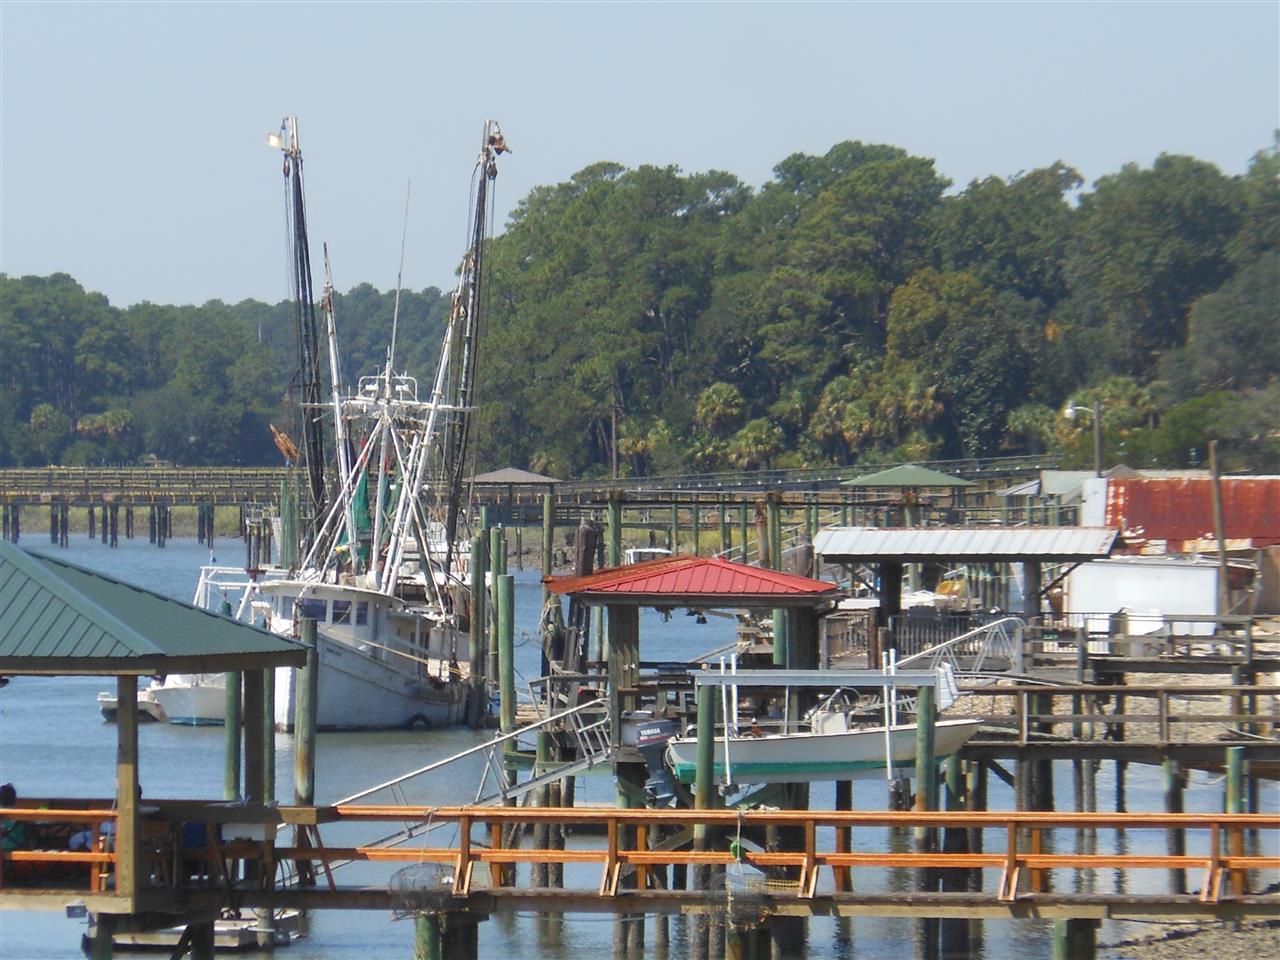 Bluffton/ Hilton Head Island SC, shrimp boat and docks on the May River